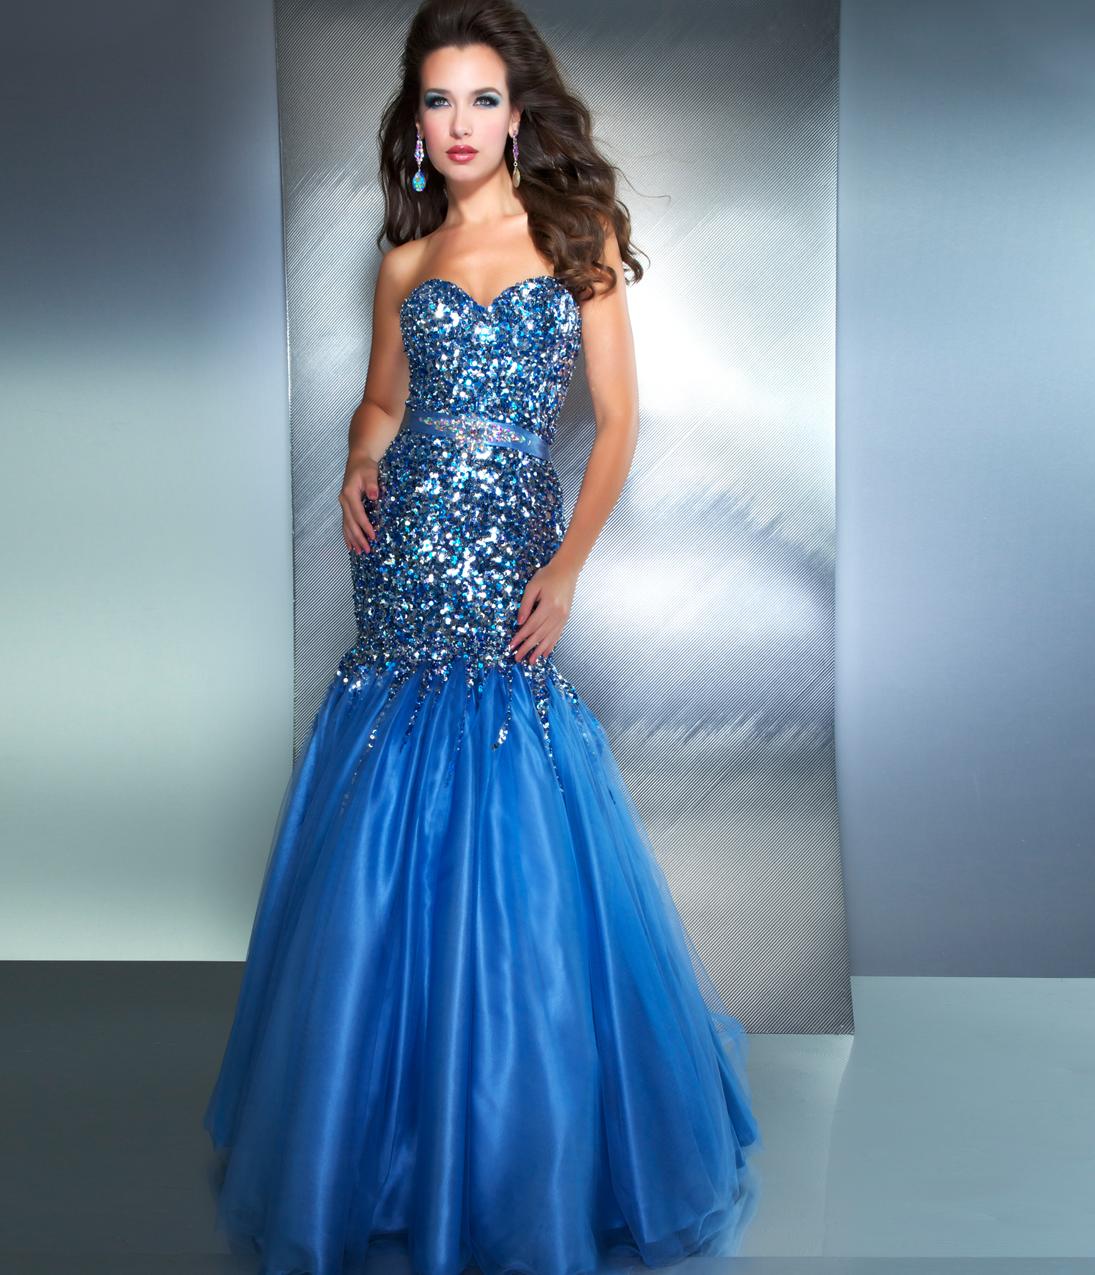 Blue Mermaid Prom Dress | Cocktail Dresses 2016